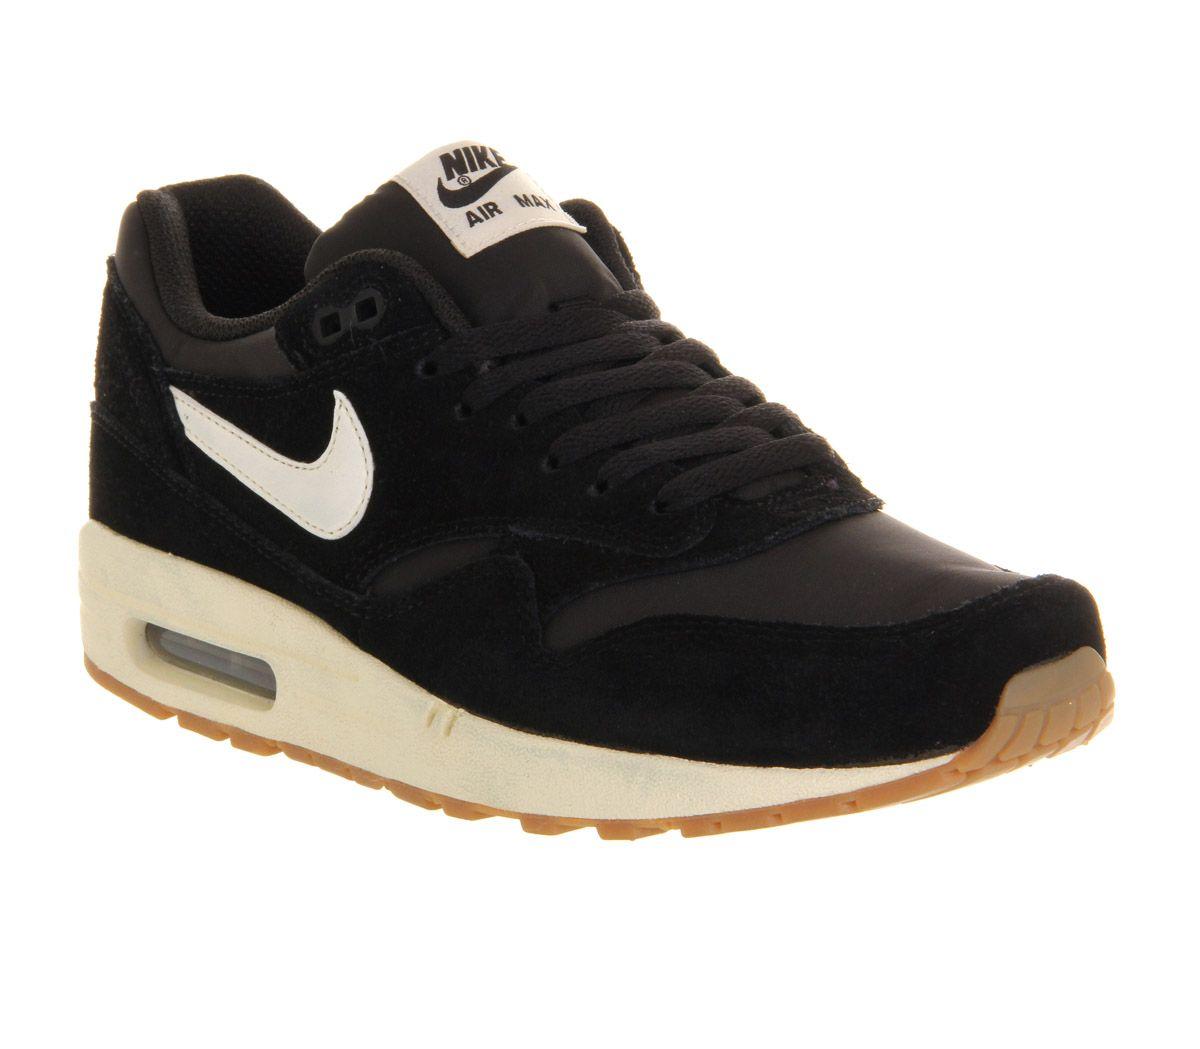 Nike Air Max 1 Schuh Essentiel Noir / Voile / Noir